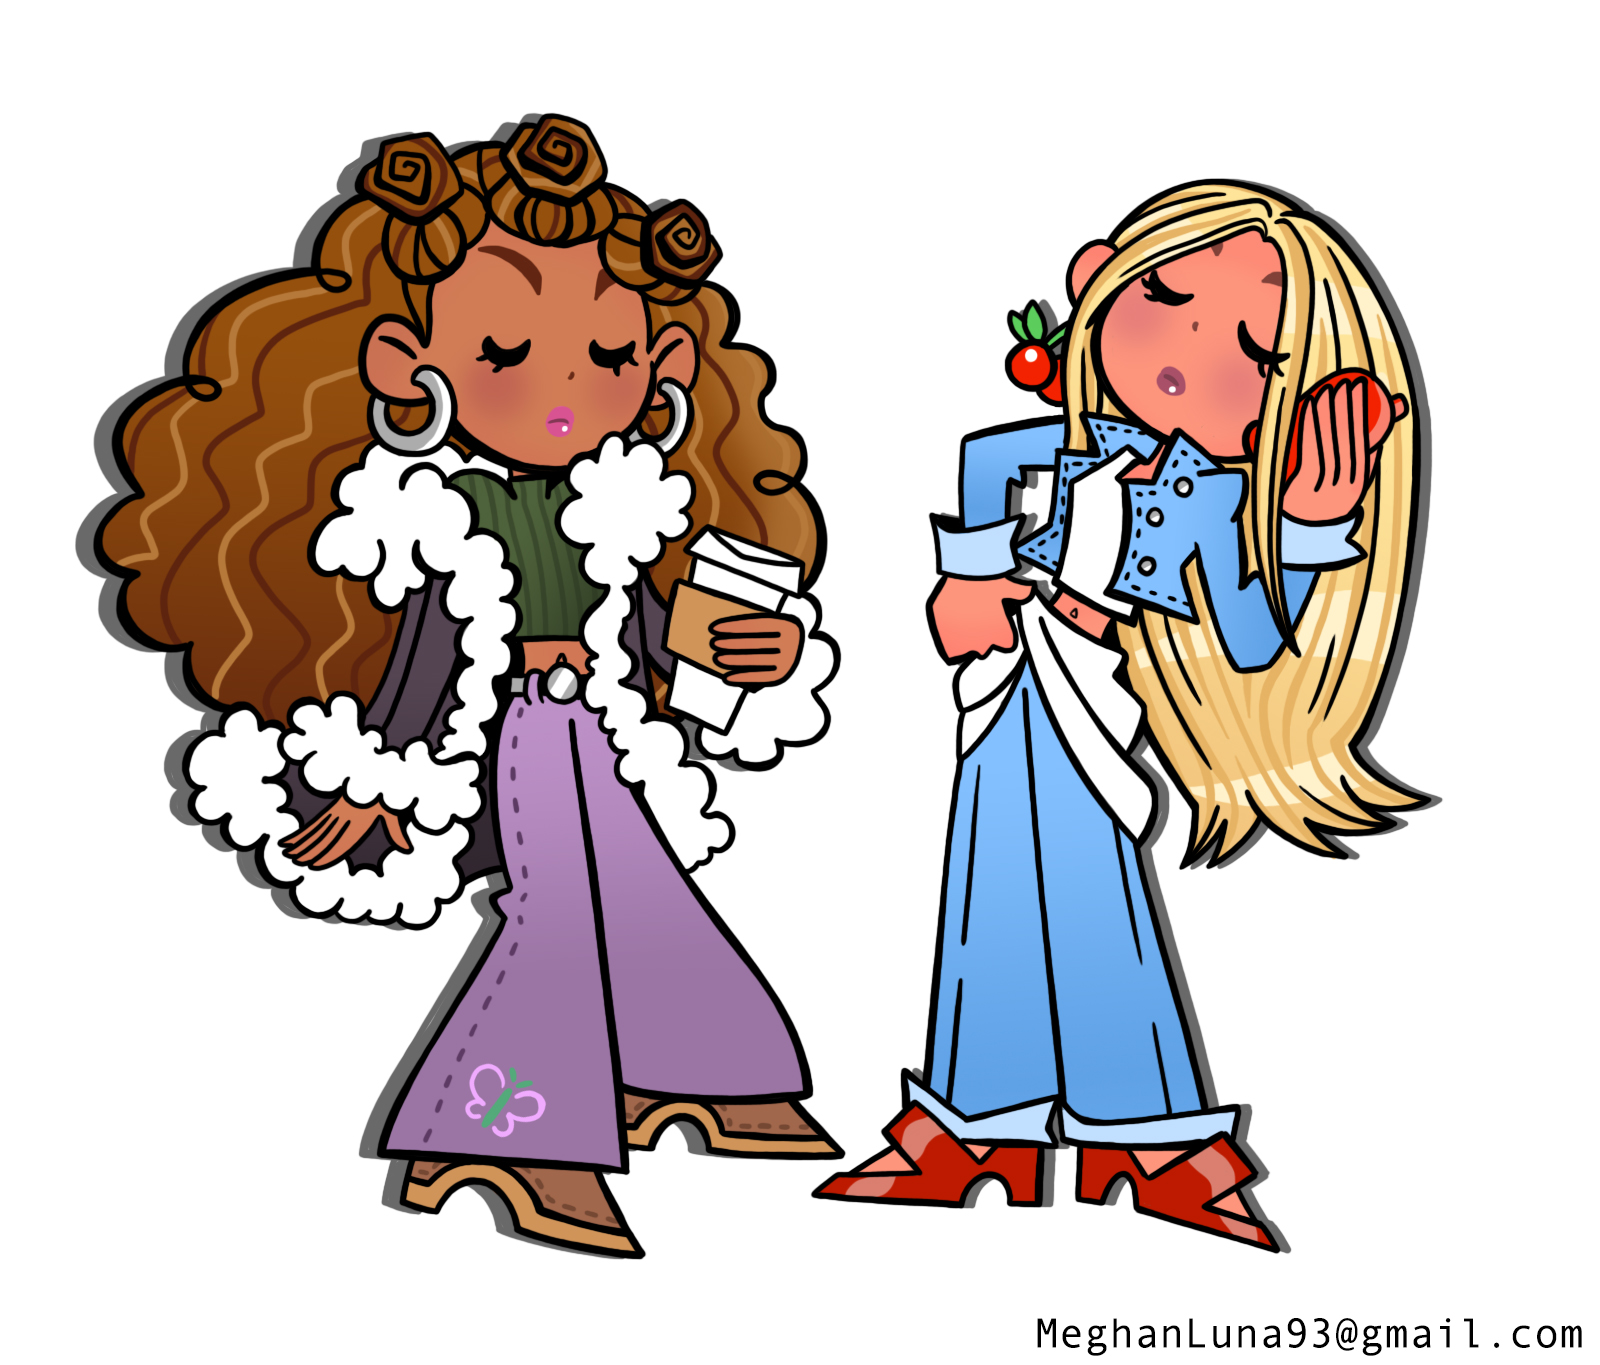 MyScene - Madison and Barbie